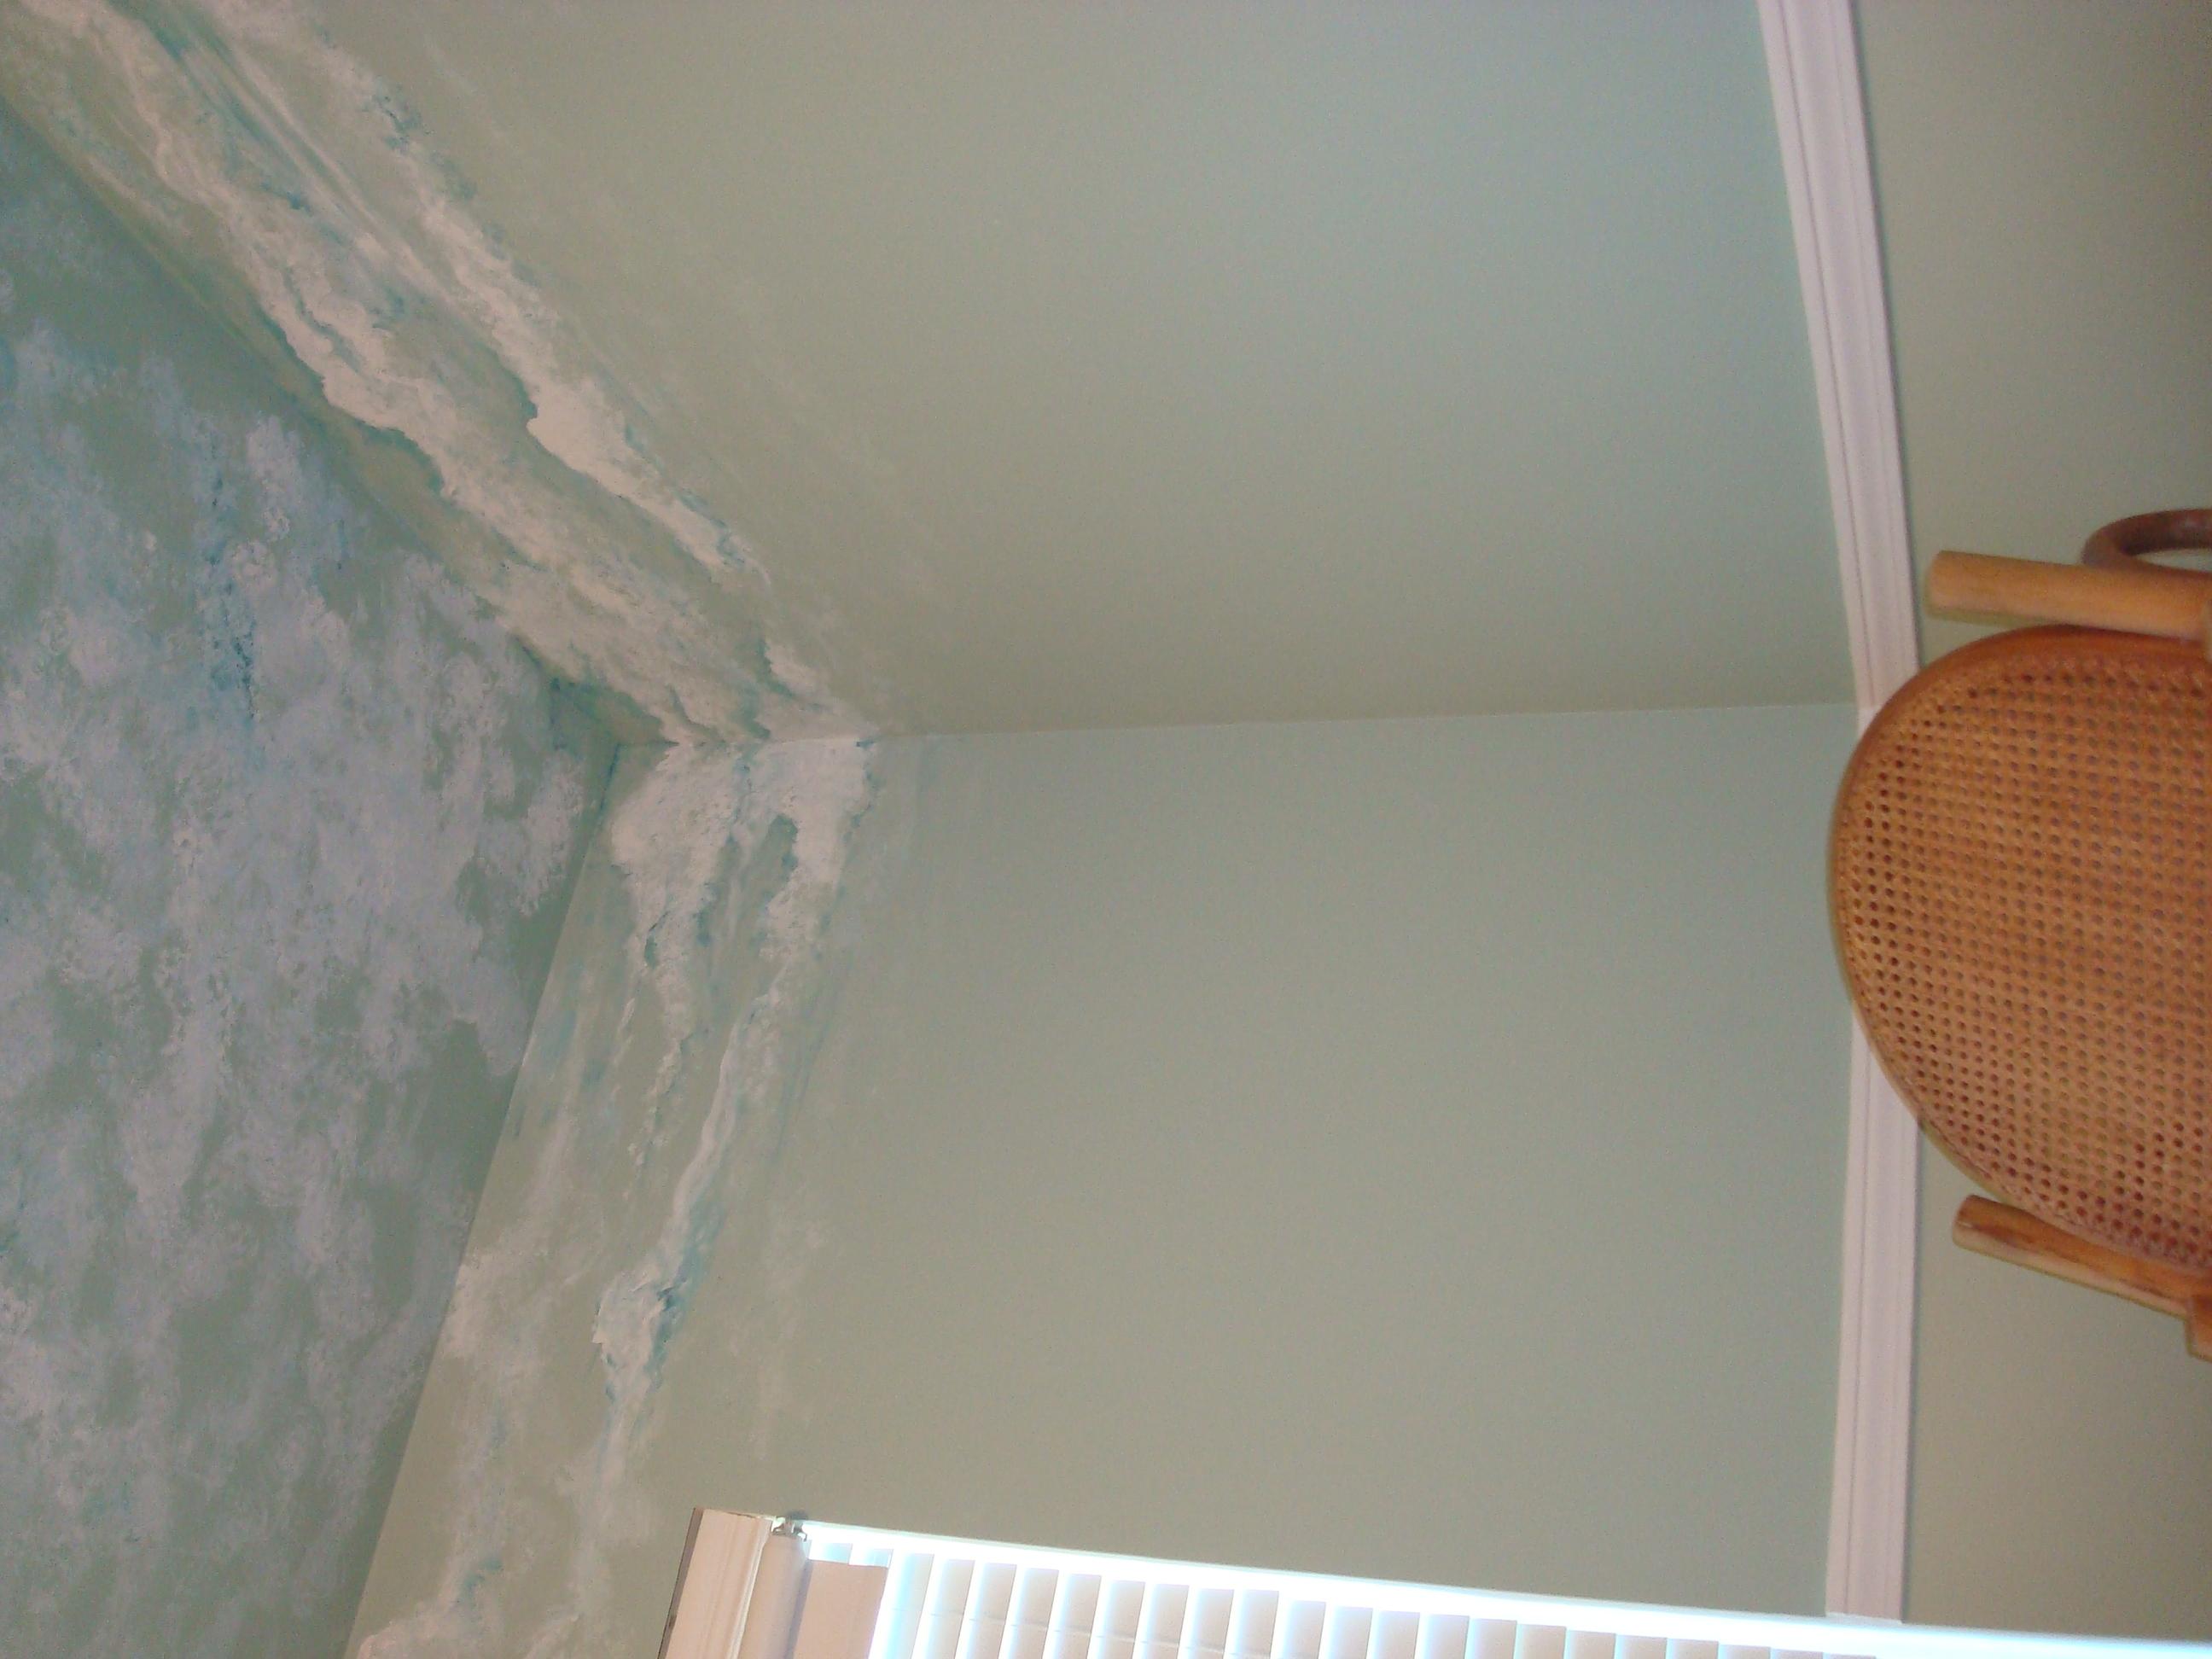 wallpapercomphotosherwin williams wallpaper murals14html 2592x1944